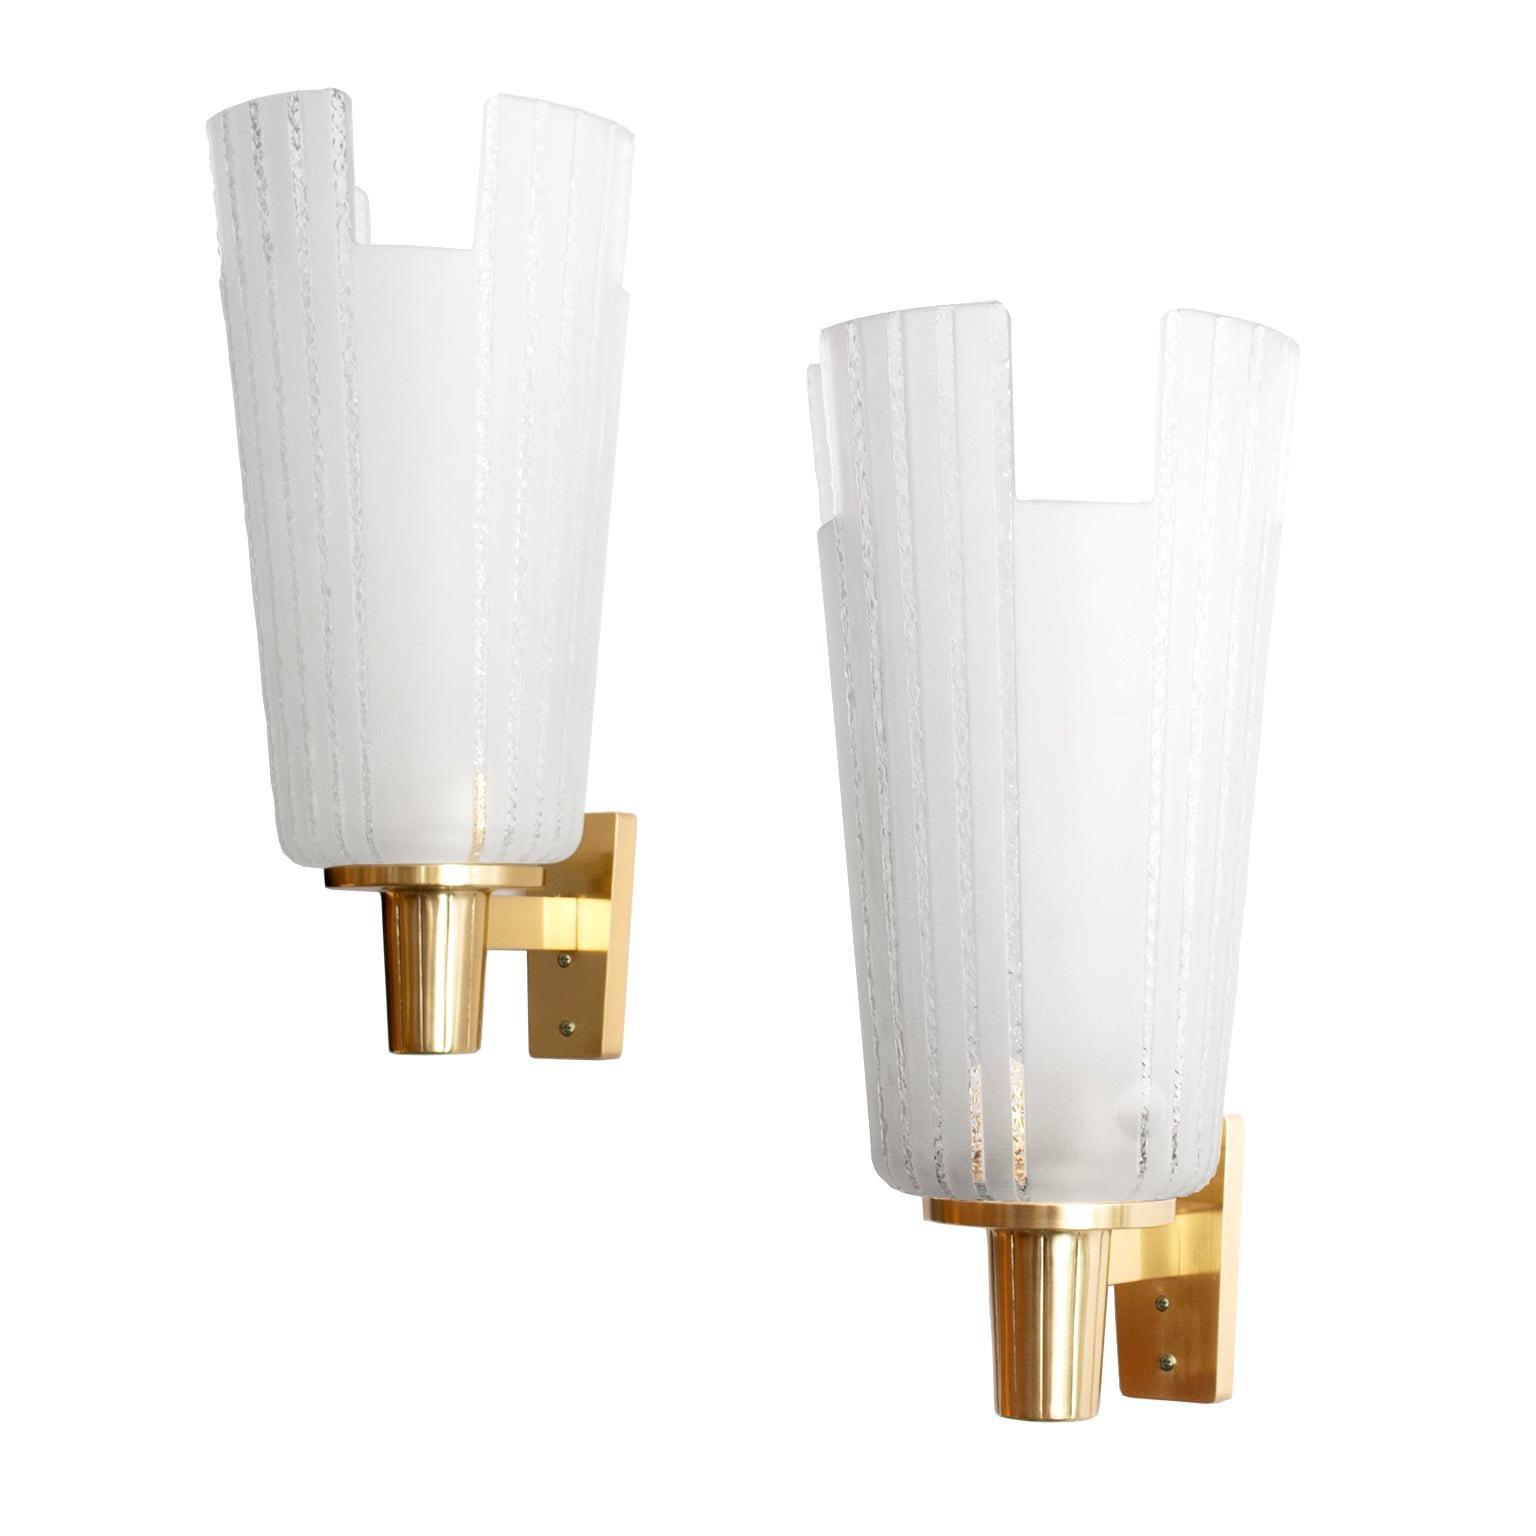 Böhlmarks, Scandinavian Modern Etched Glass and Brass Sconces Swedish Art Deco